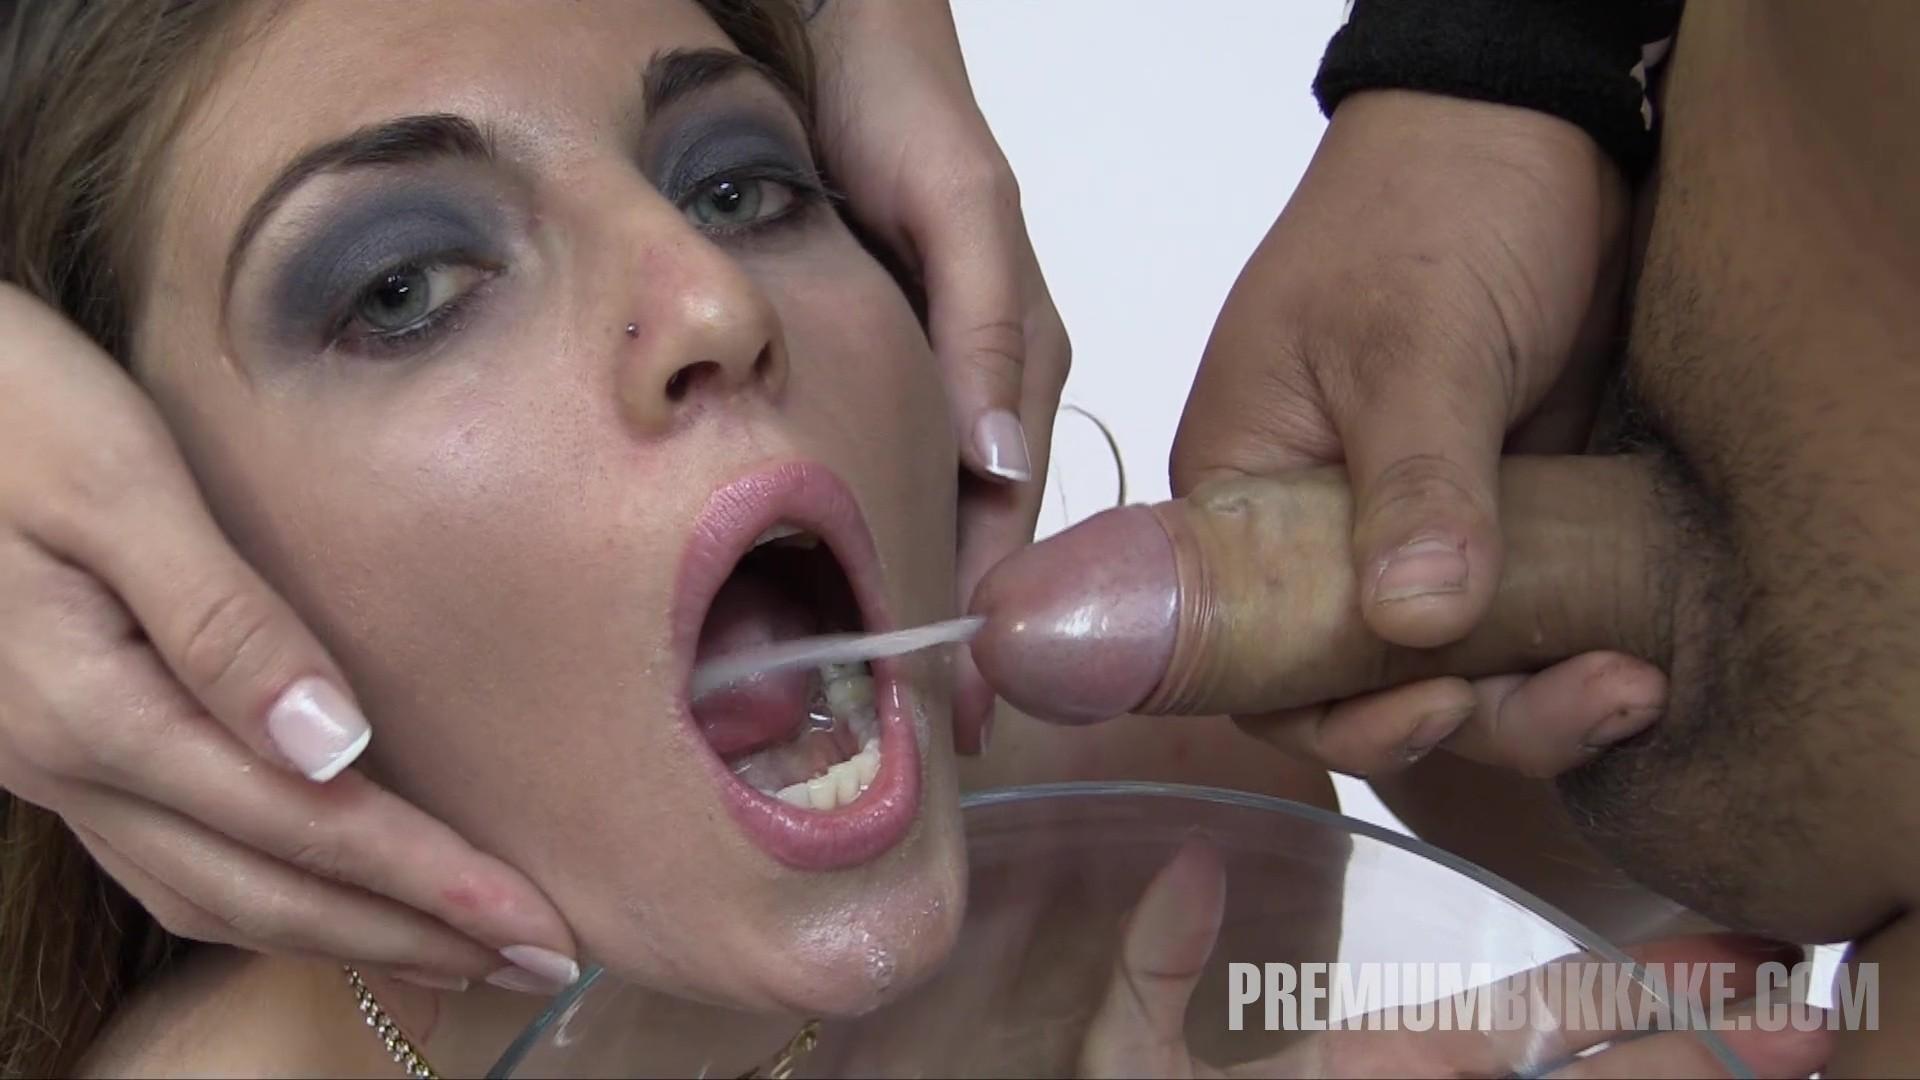 Huge boob lesbian sucking